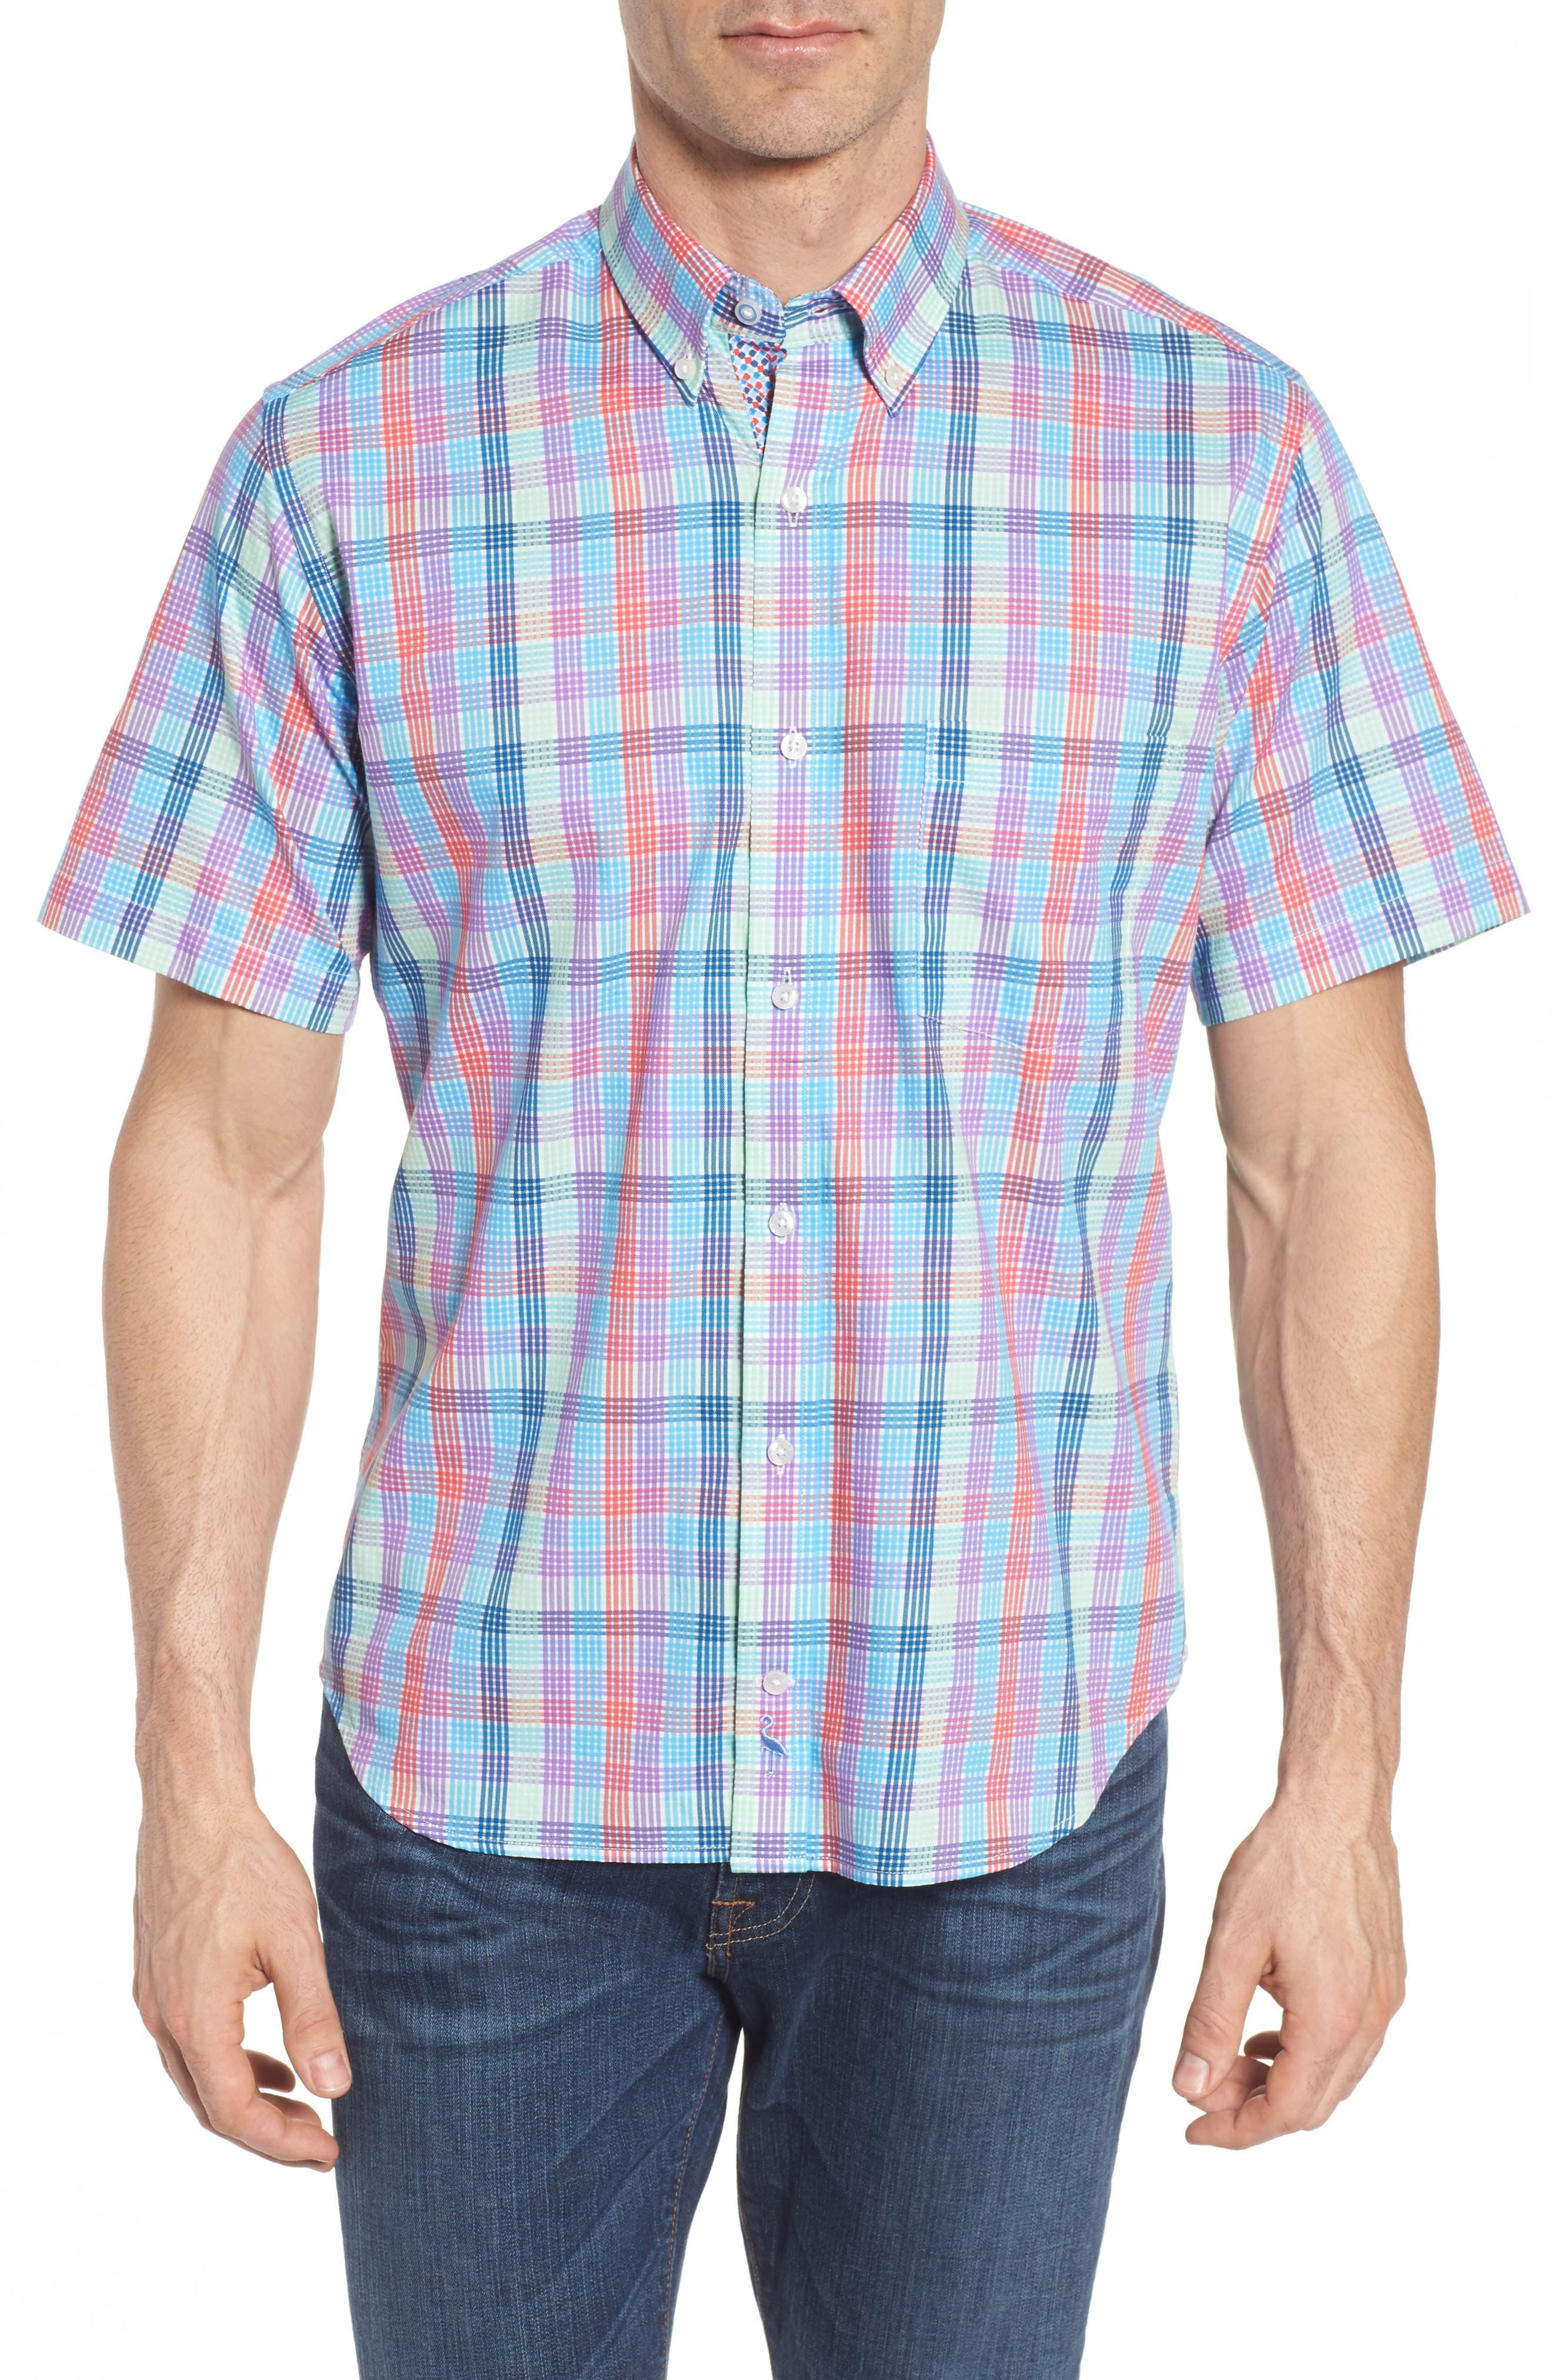 Main Image - TailorByrd Slidell Regular Fit Check Sport Shirt